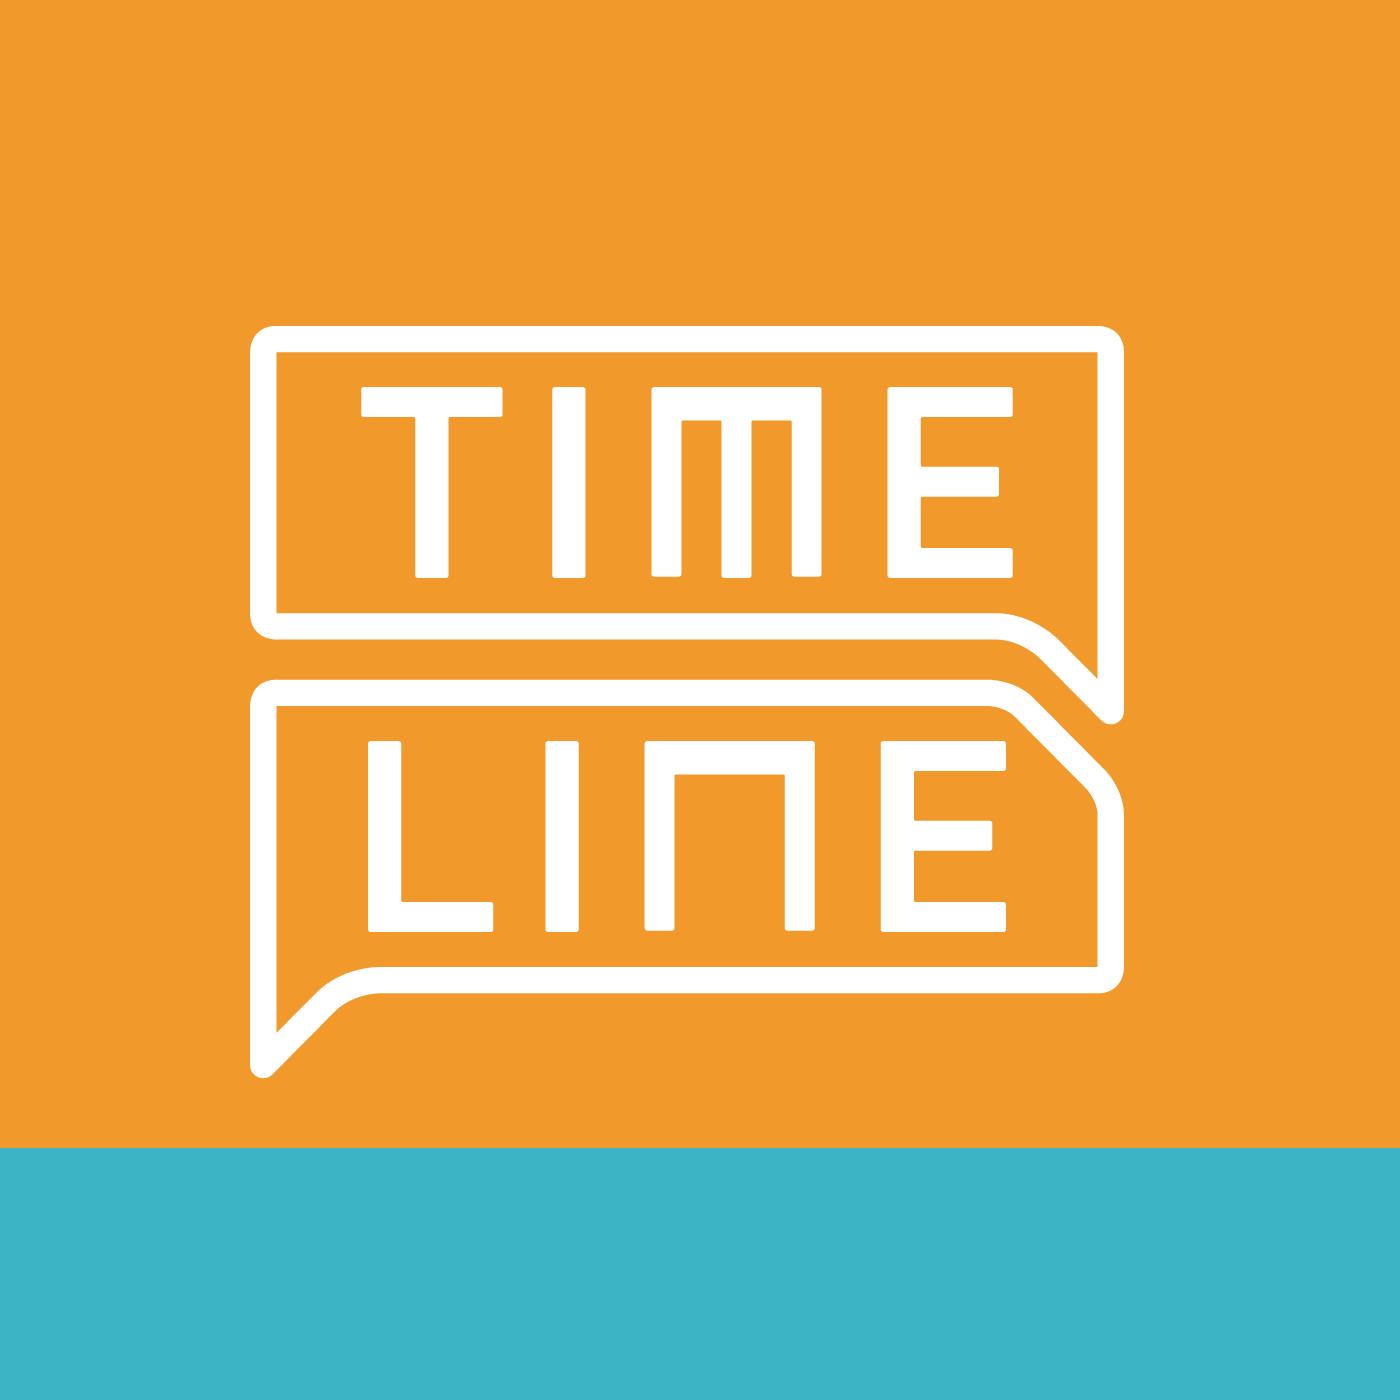 Timeline Gaúcha 21/07/2017